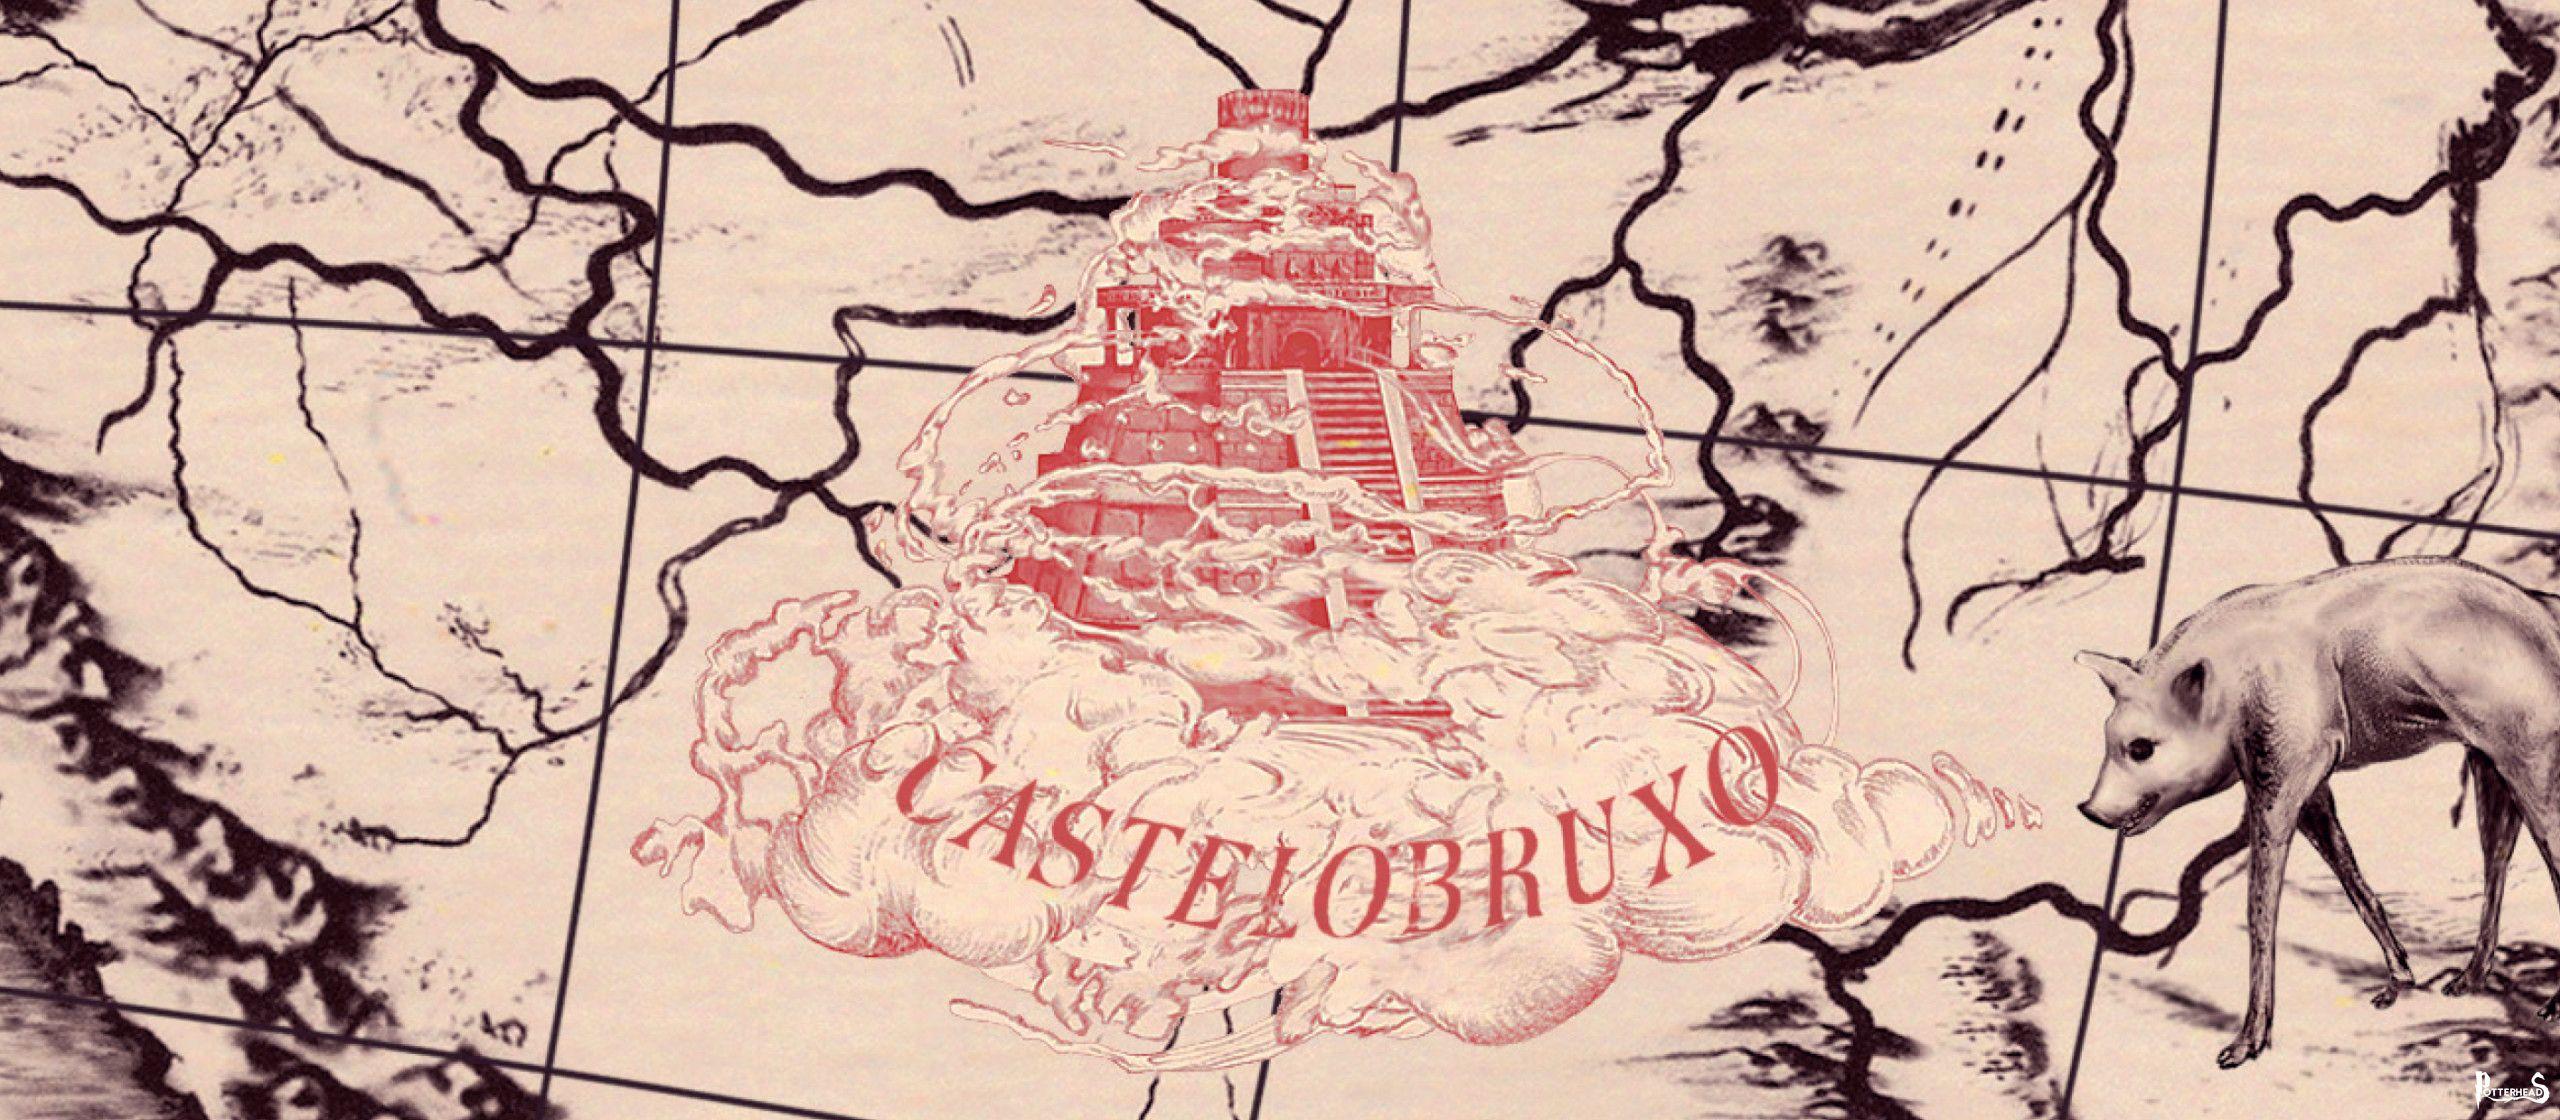 Castelobruxo Harry Potter - PotterPedia.it